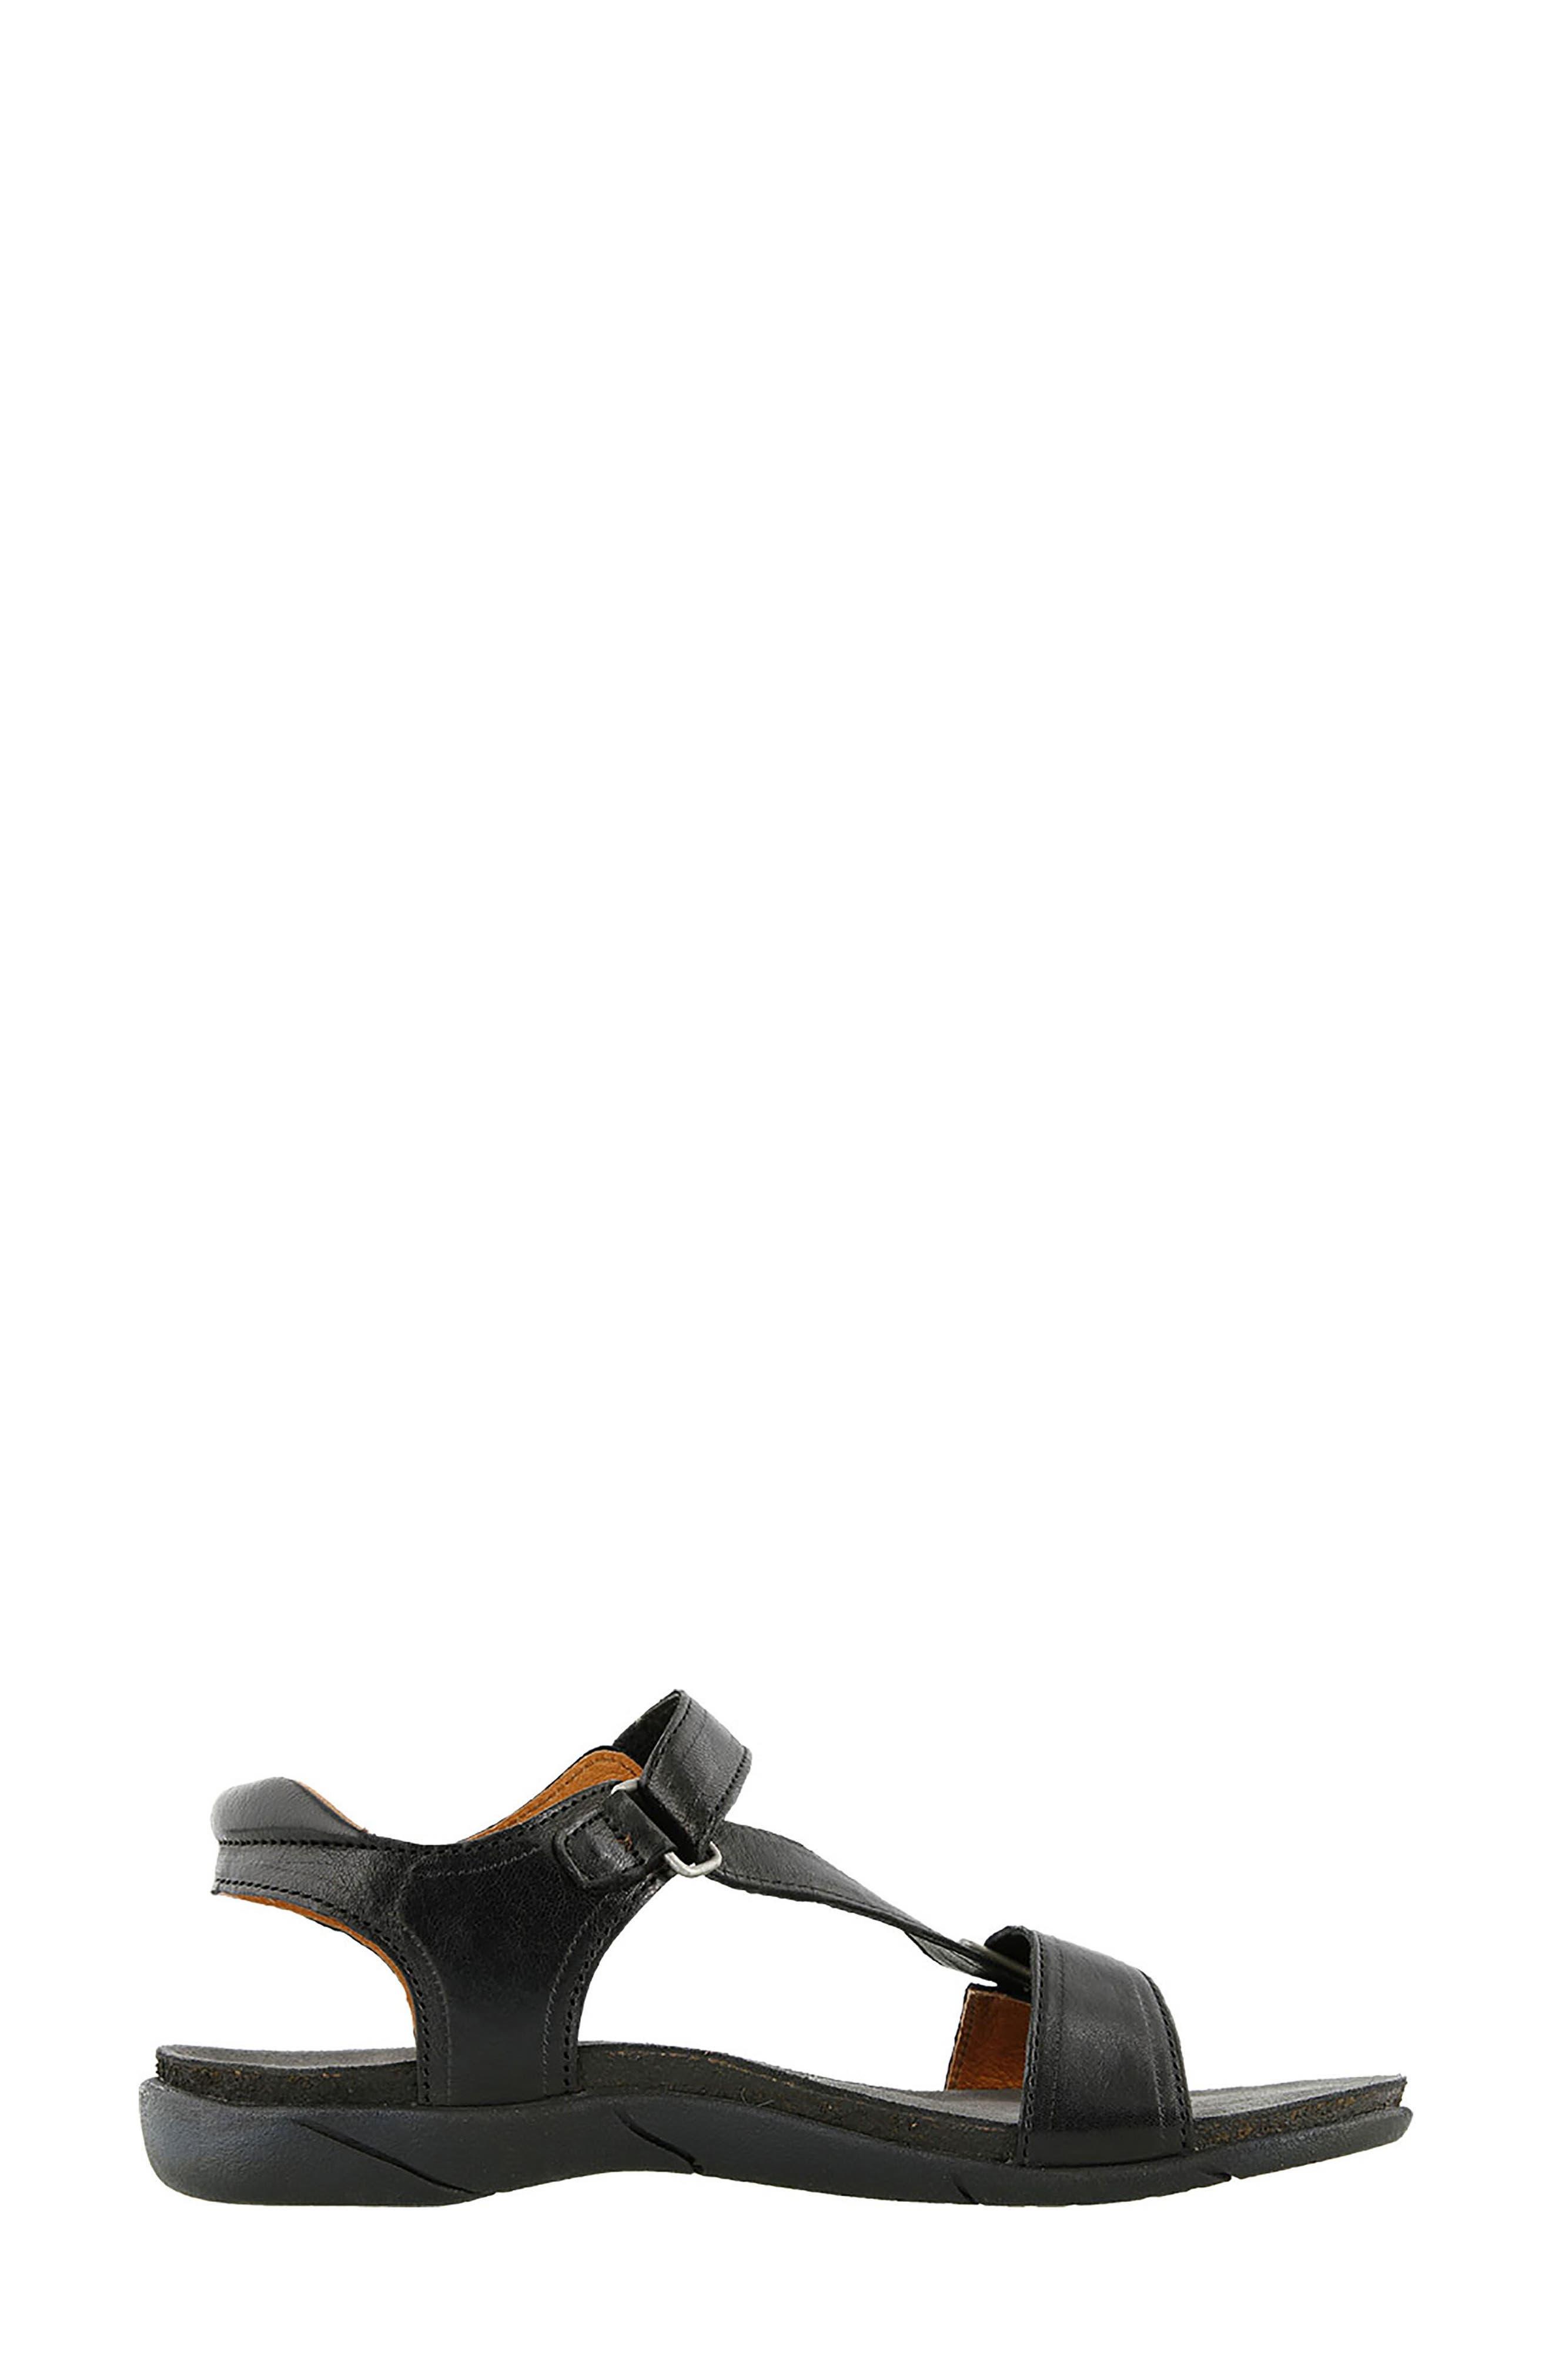 Zeal Sandal,                             Alternate thumbnail 3, color,                             Black Leather